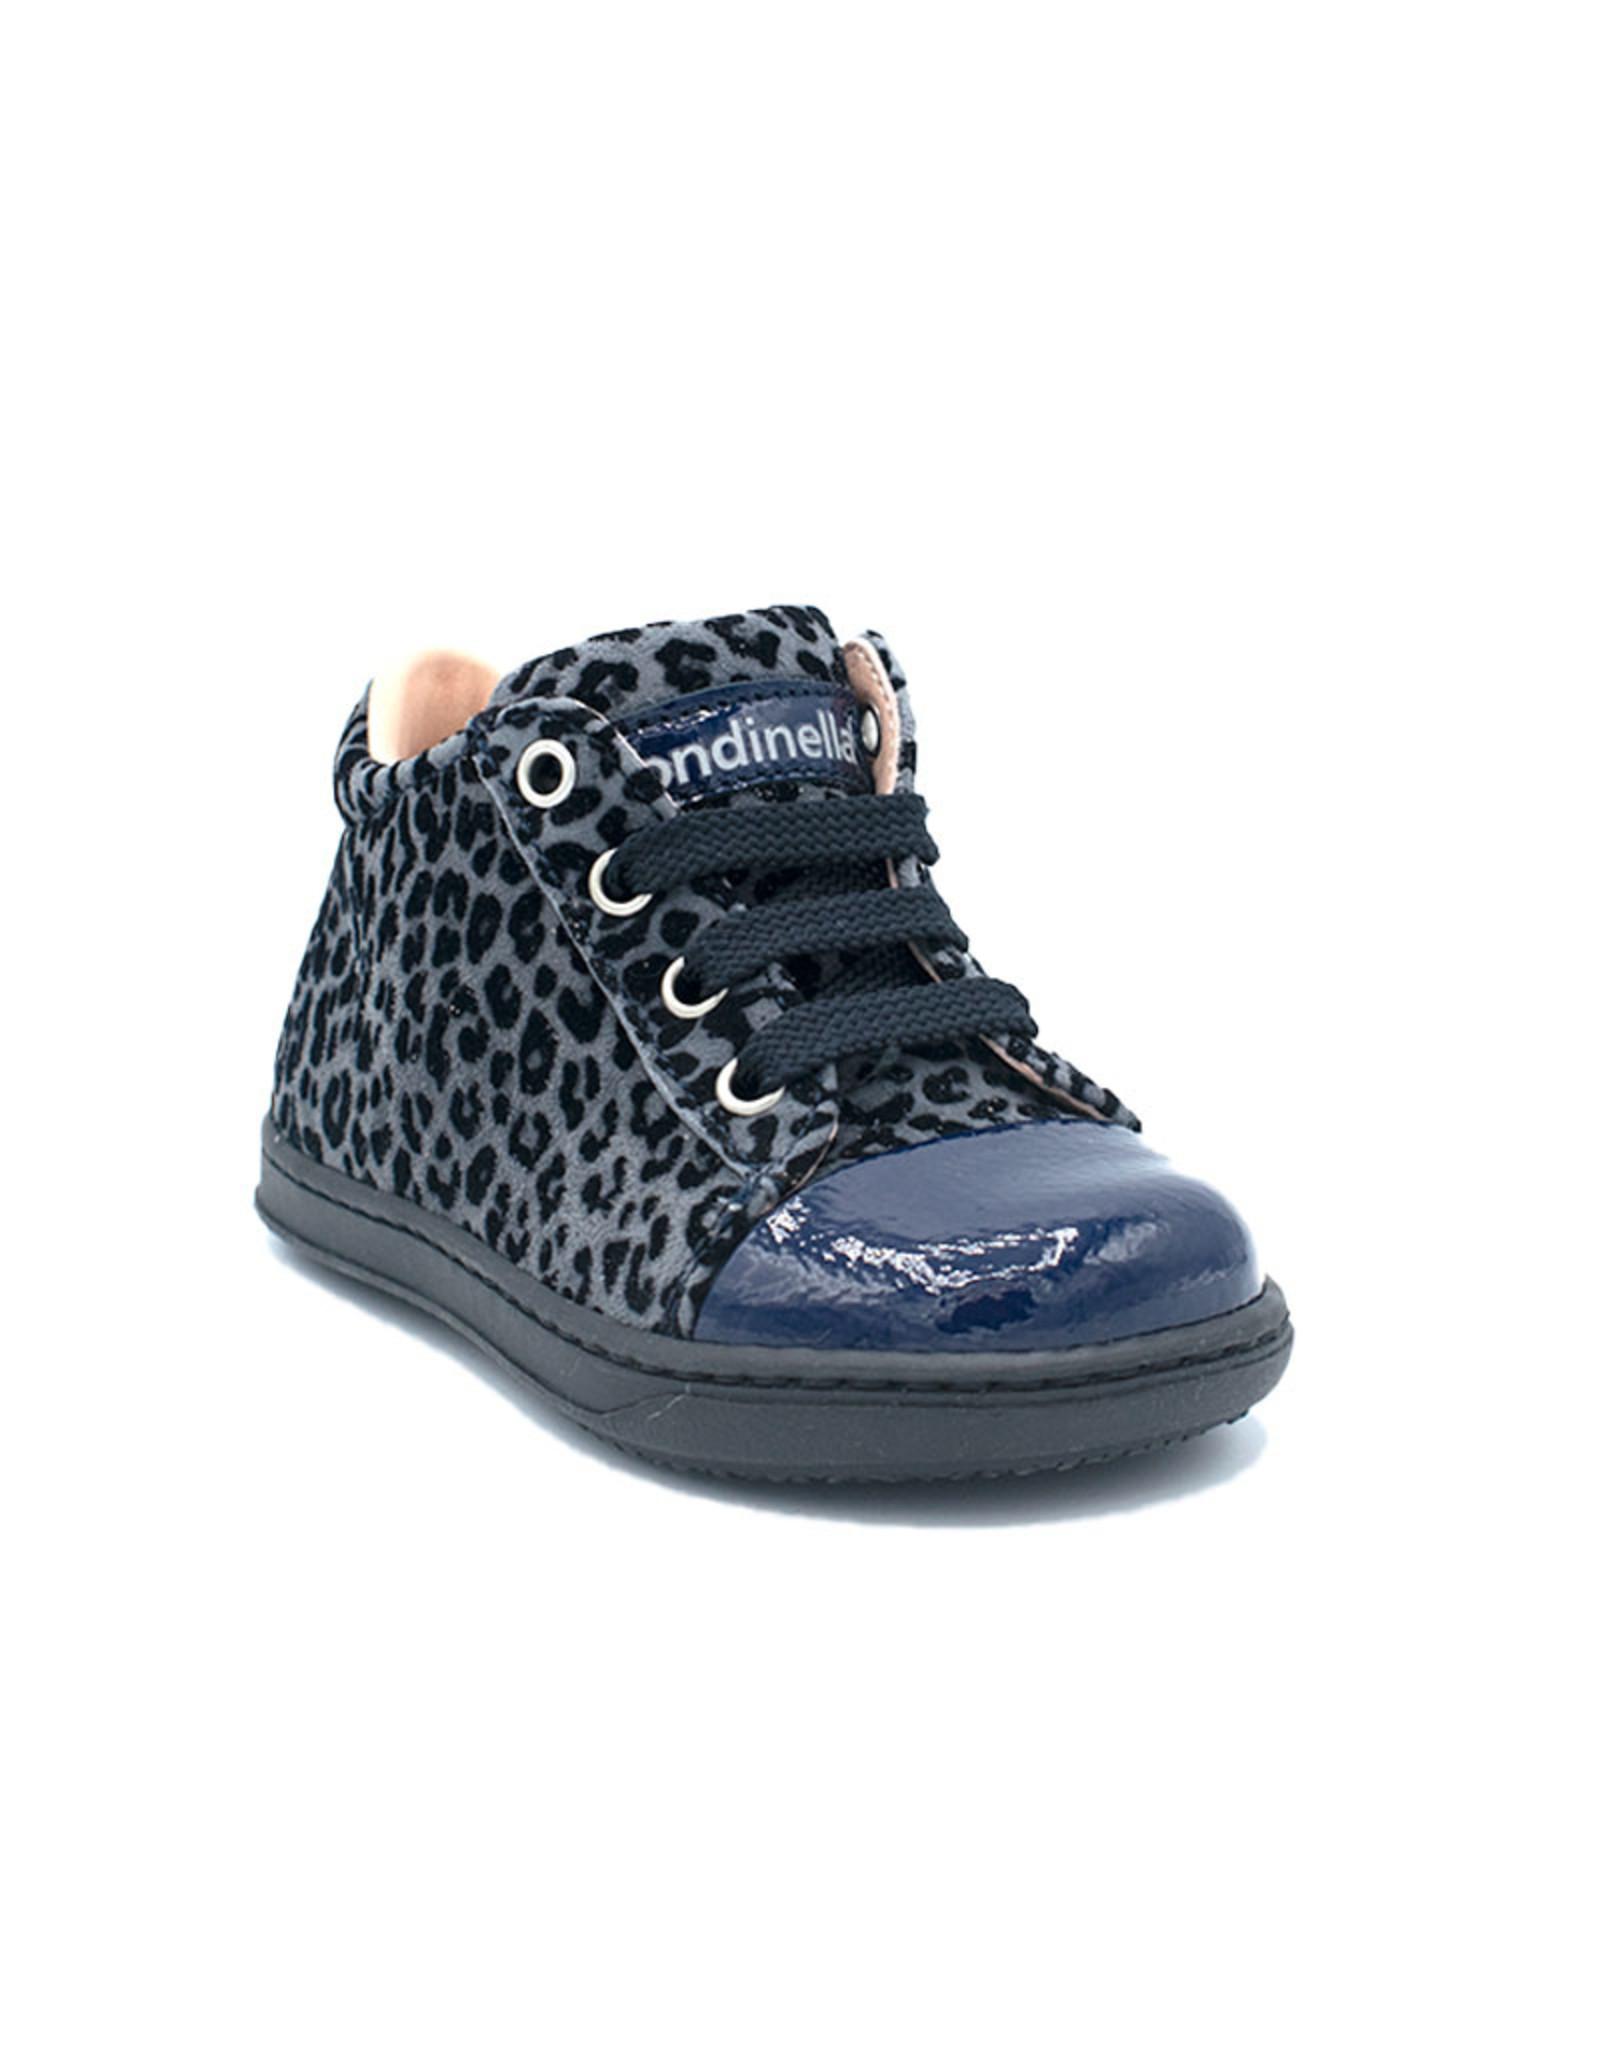 RONDINELLA RONDINELLA sneaker blauw luipaard